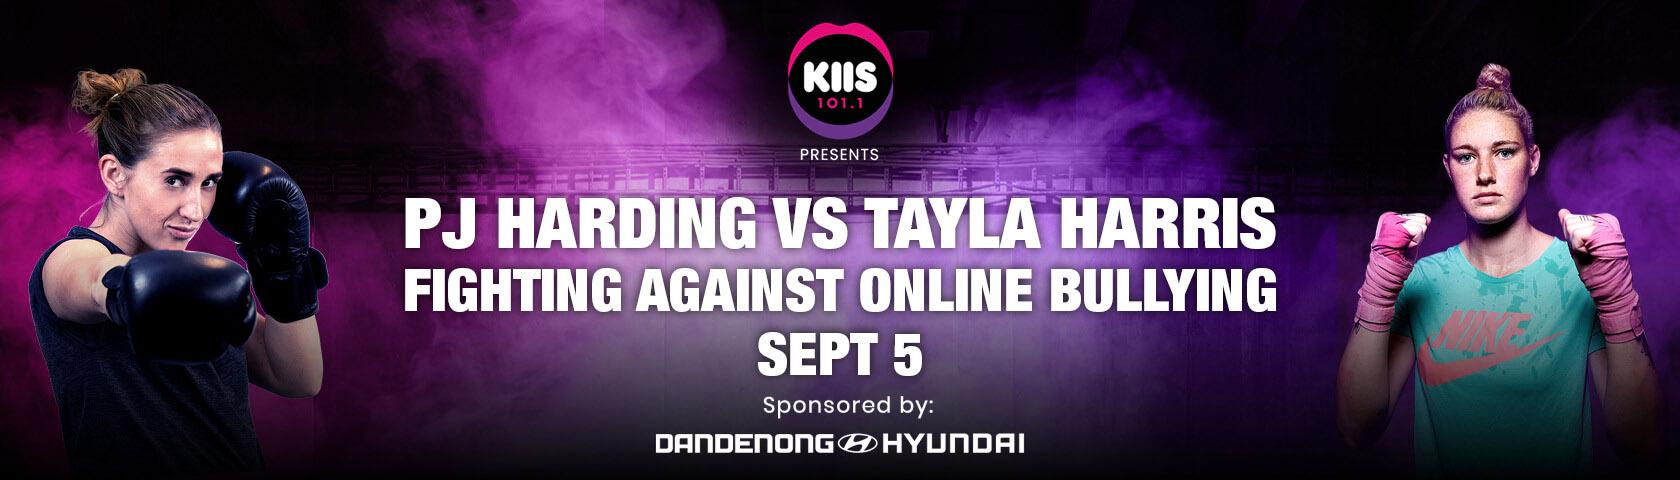 PJ Harding Vs Tayla Harris